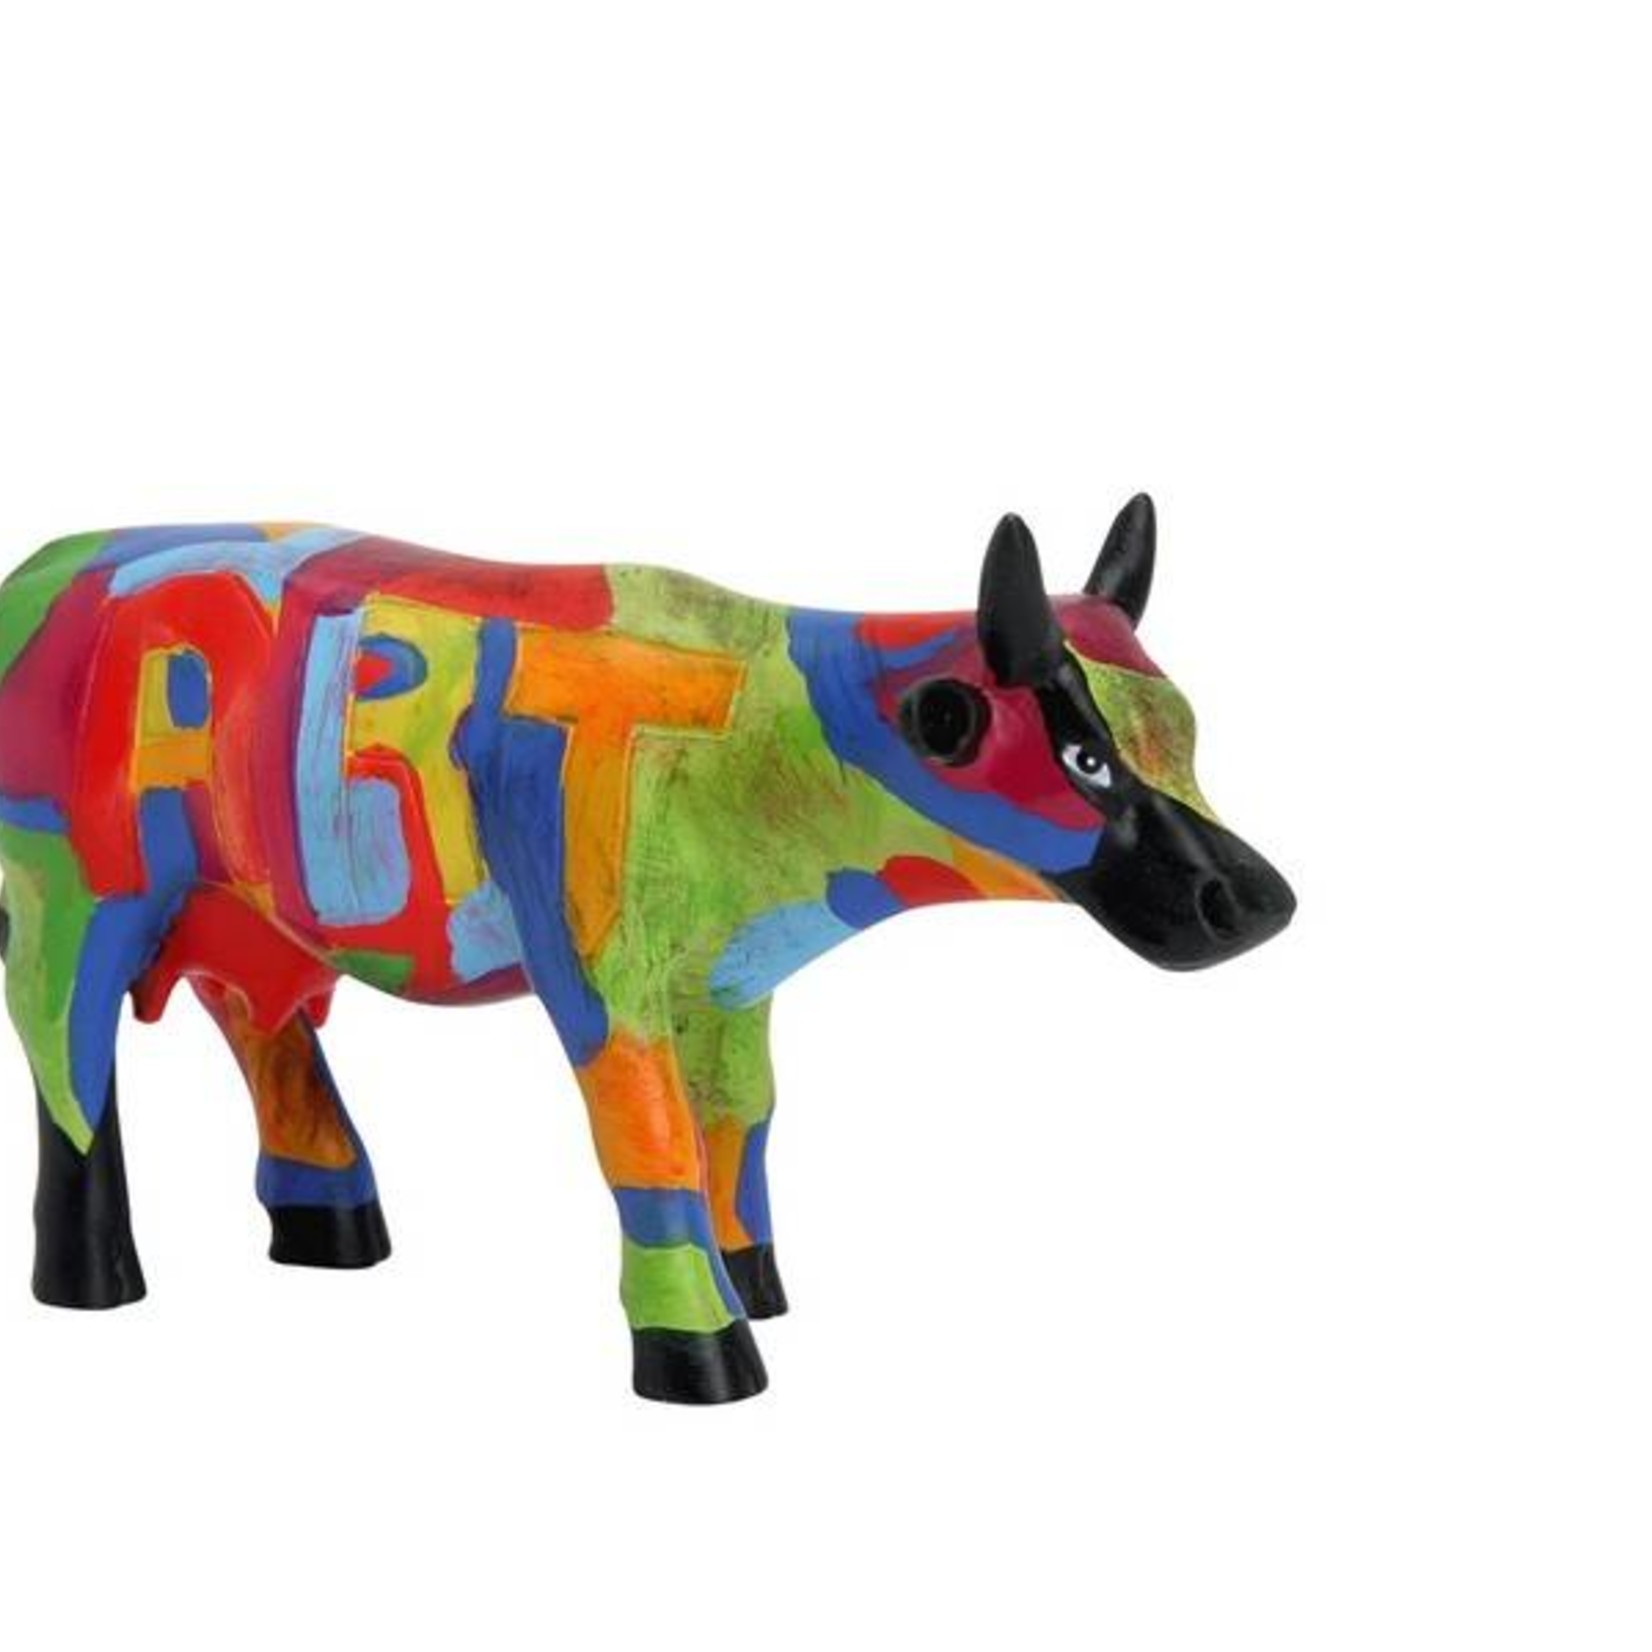 Cowparade Cowparade Small Art of America